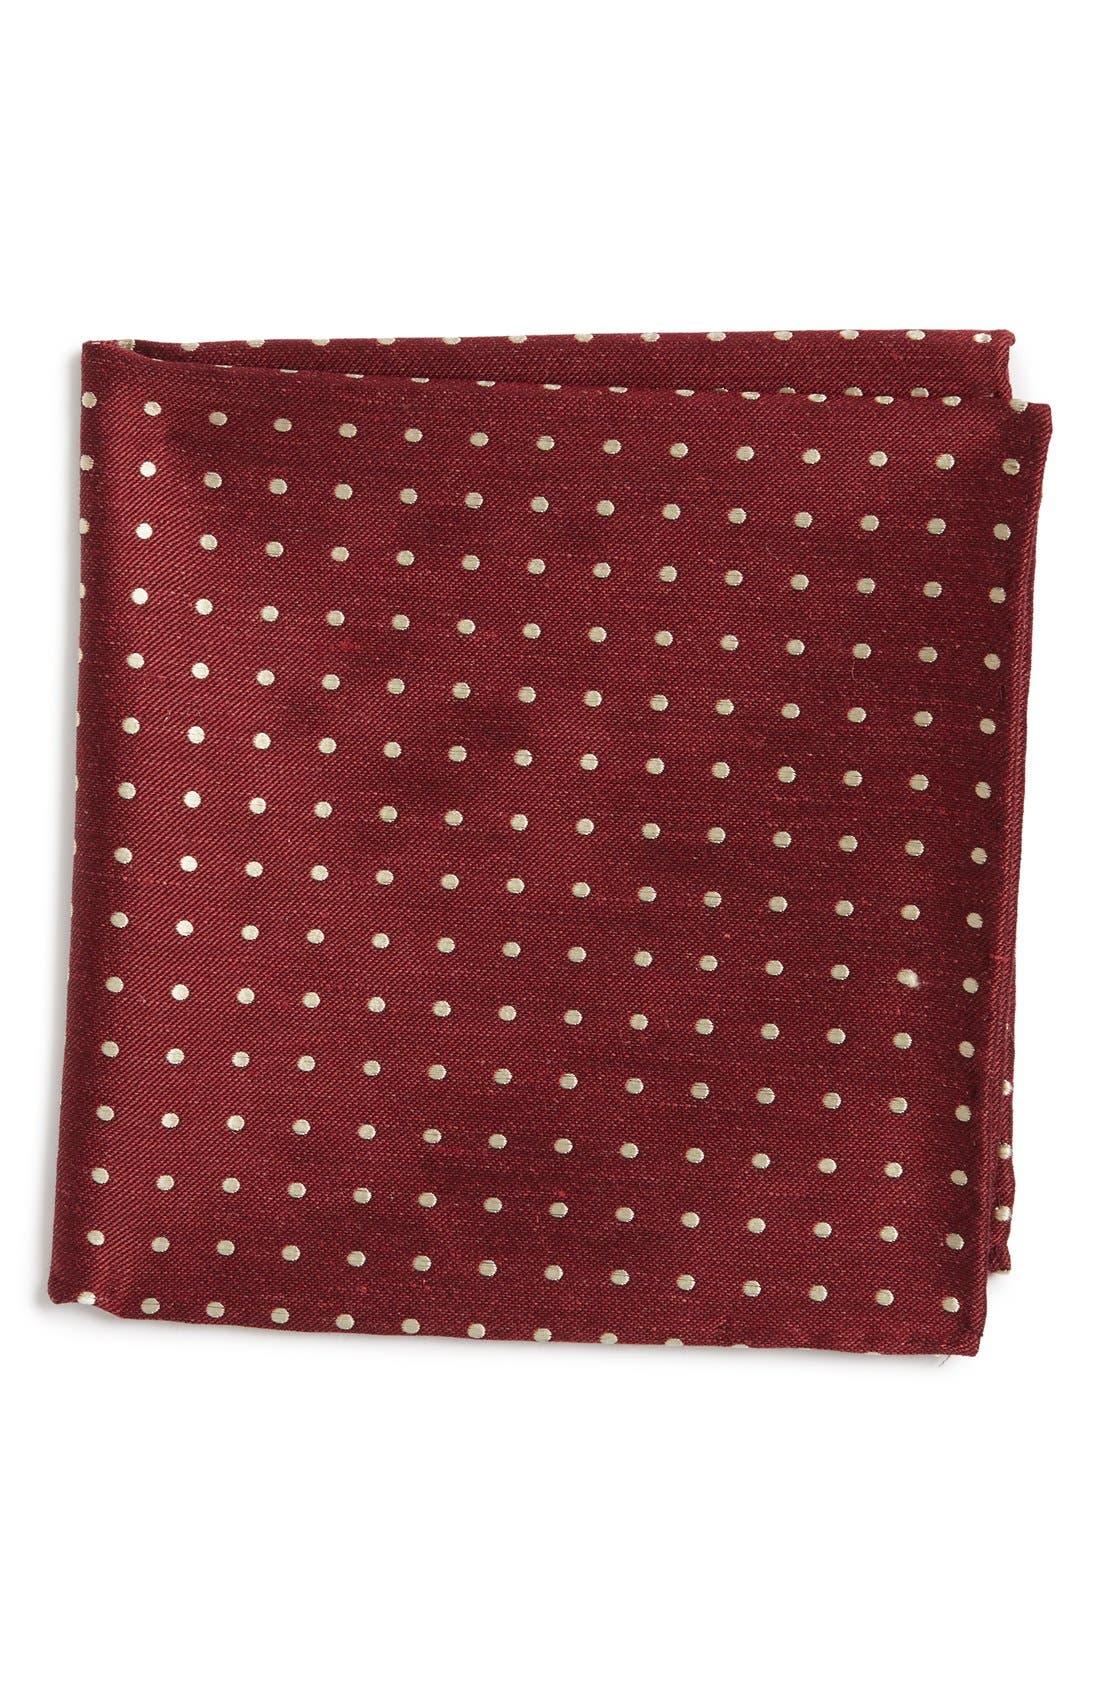 Main Image - The Tie Bar Dot Silk & Linen Pocket Square